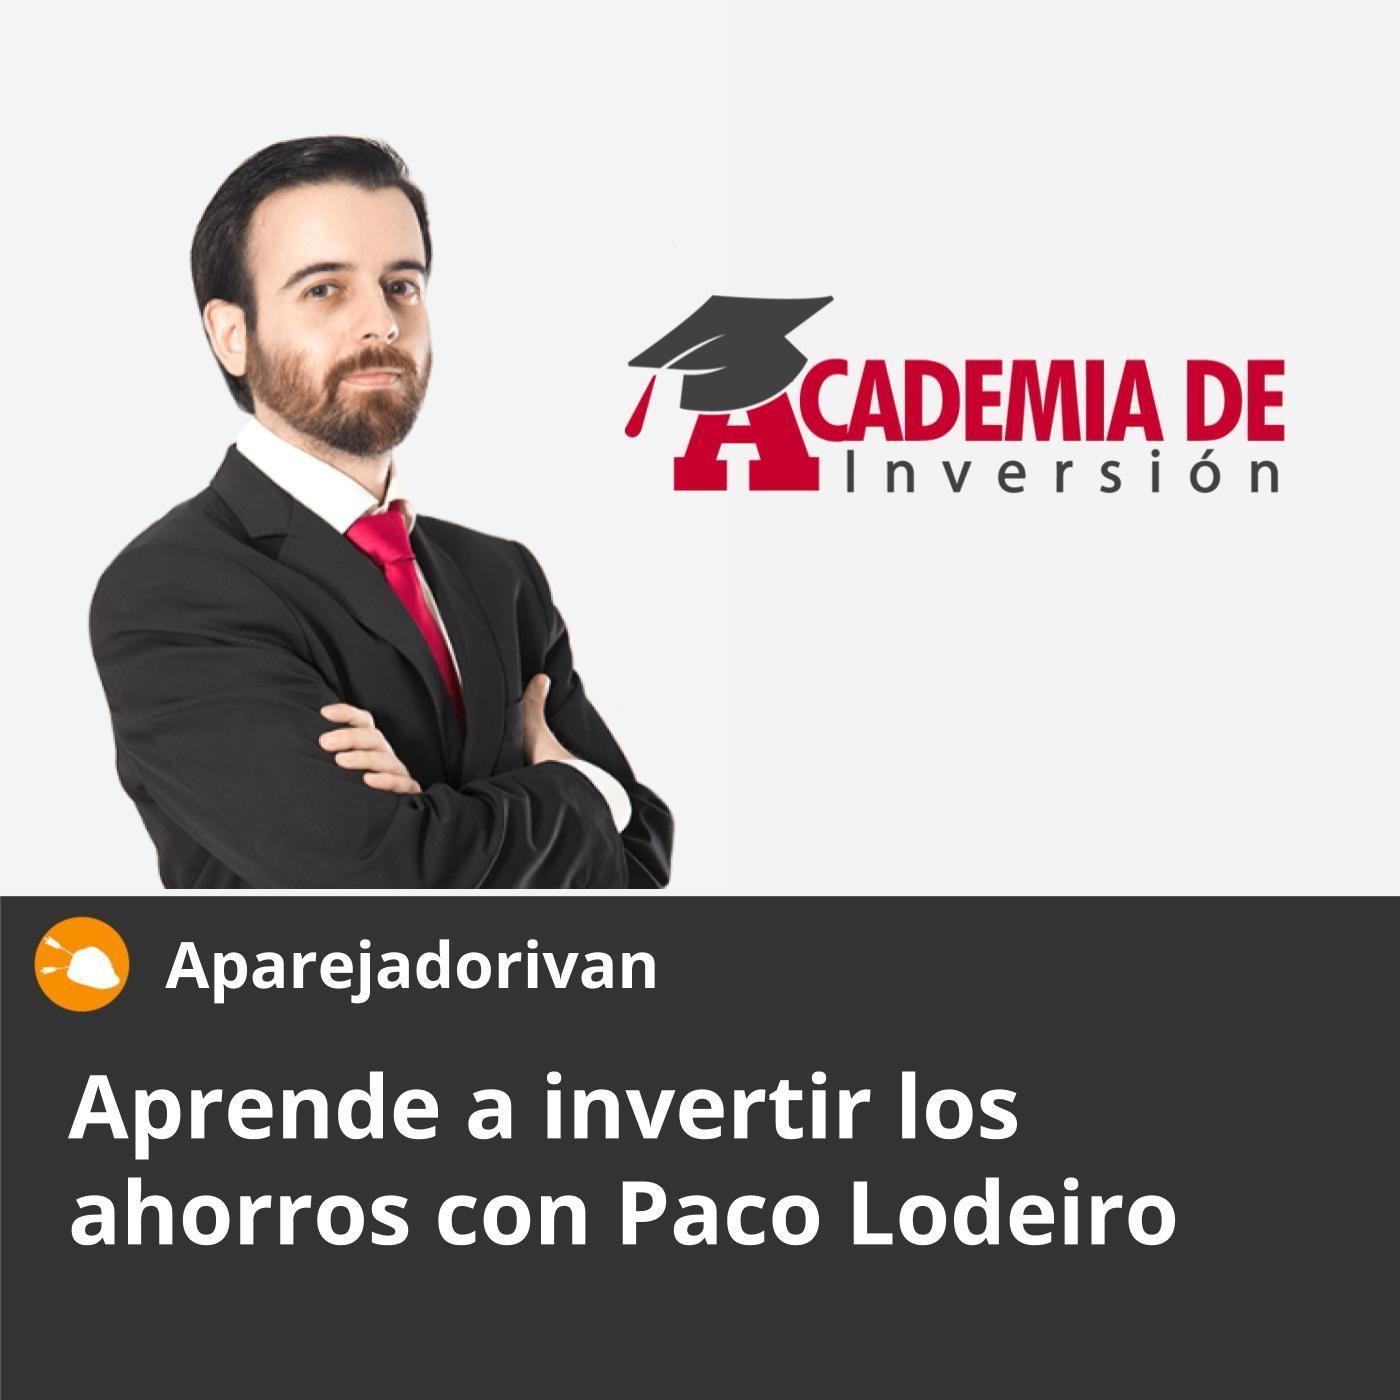 Aprende a invertir ahorros con Paco Lodeiro